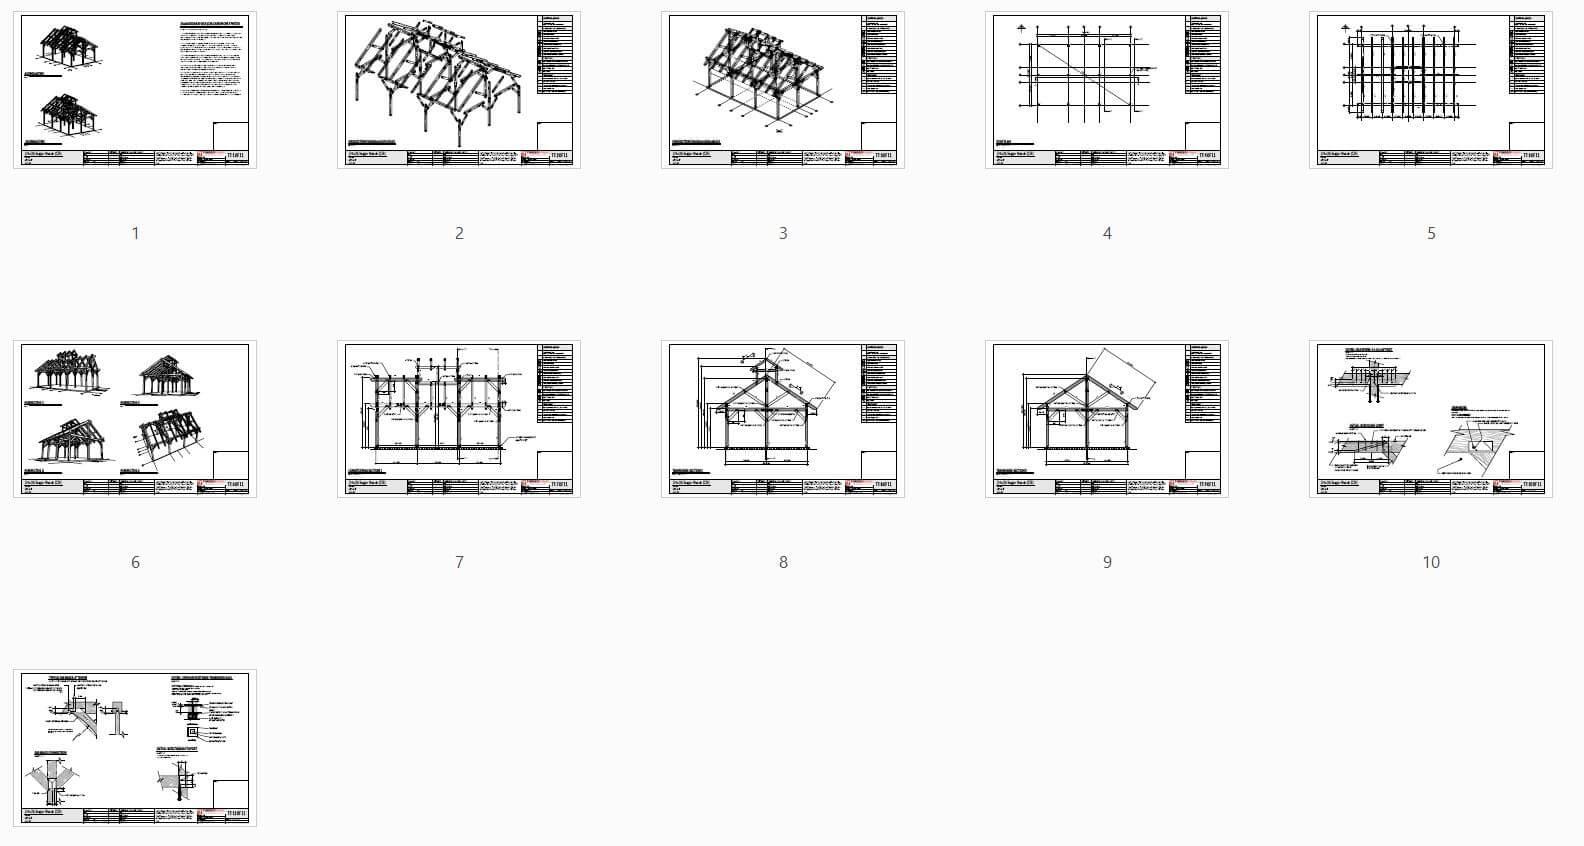 24x36 Sugar Shack Plan (43609) - Plan Overview